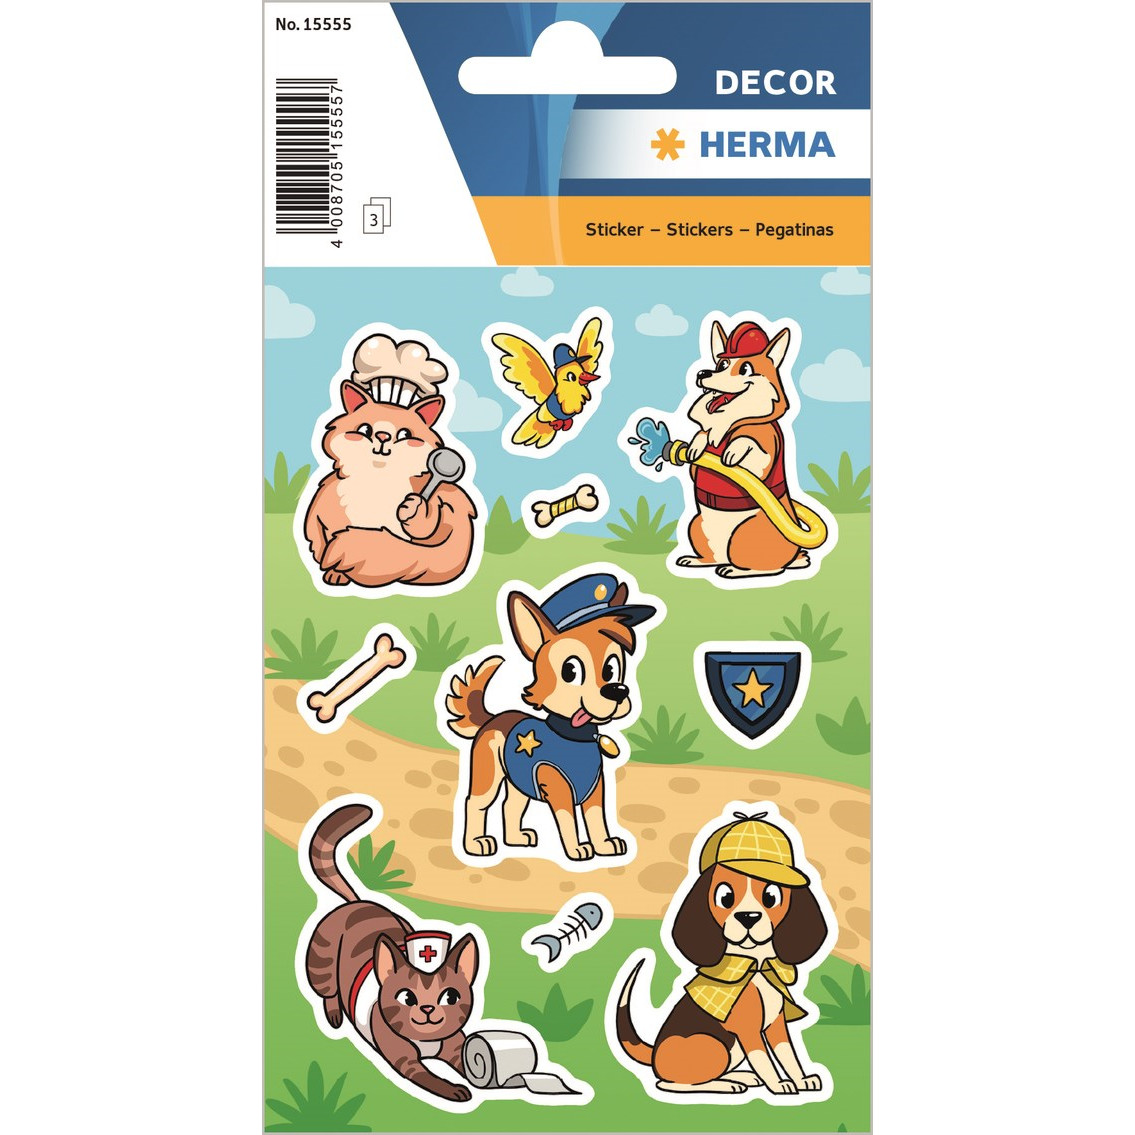 HERMA Herma stickers Decor bedste venner (3)